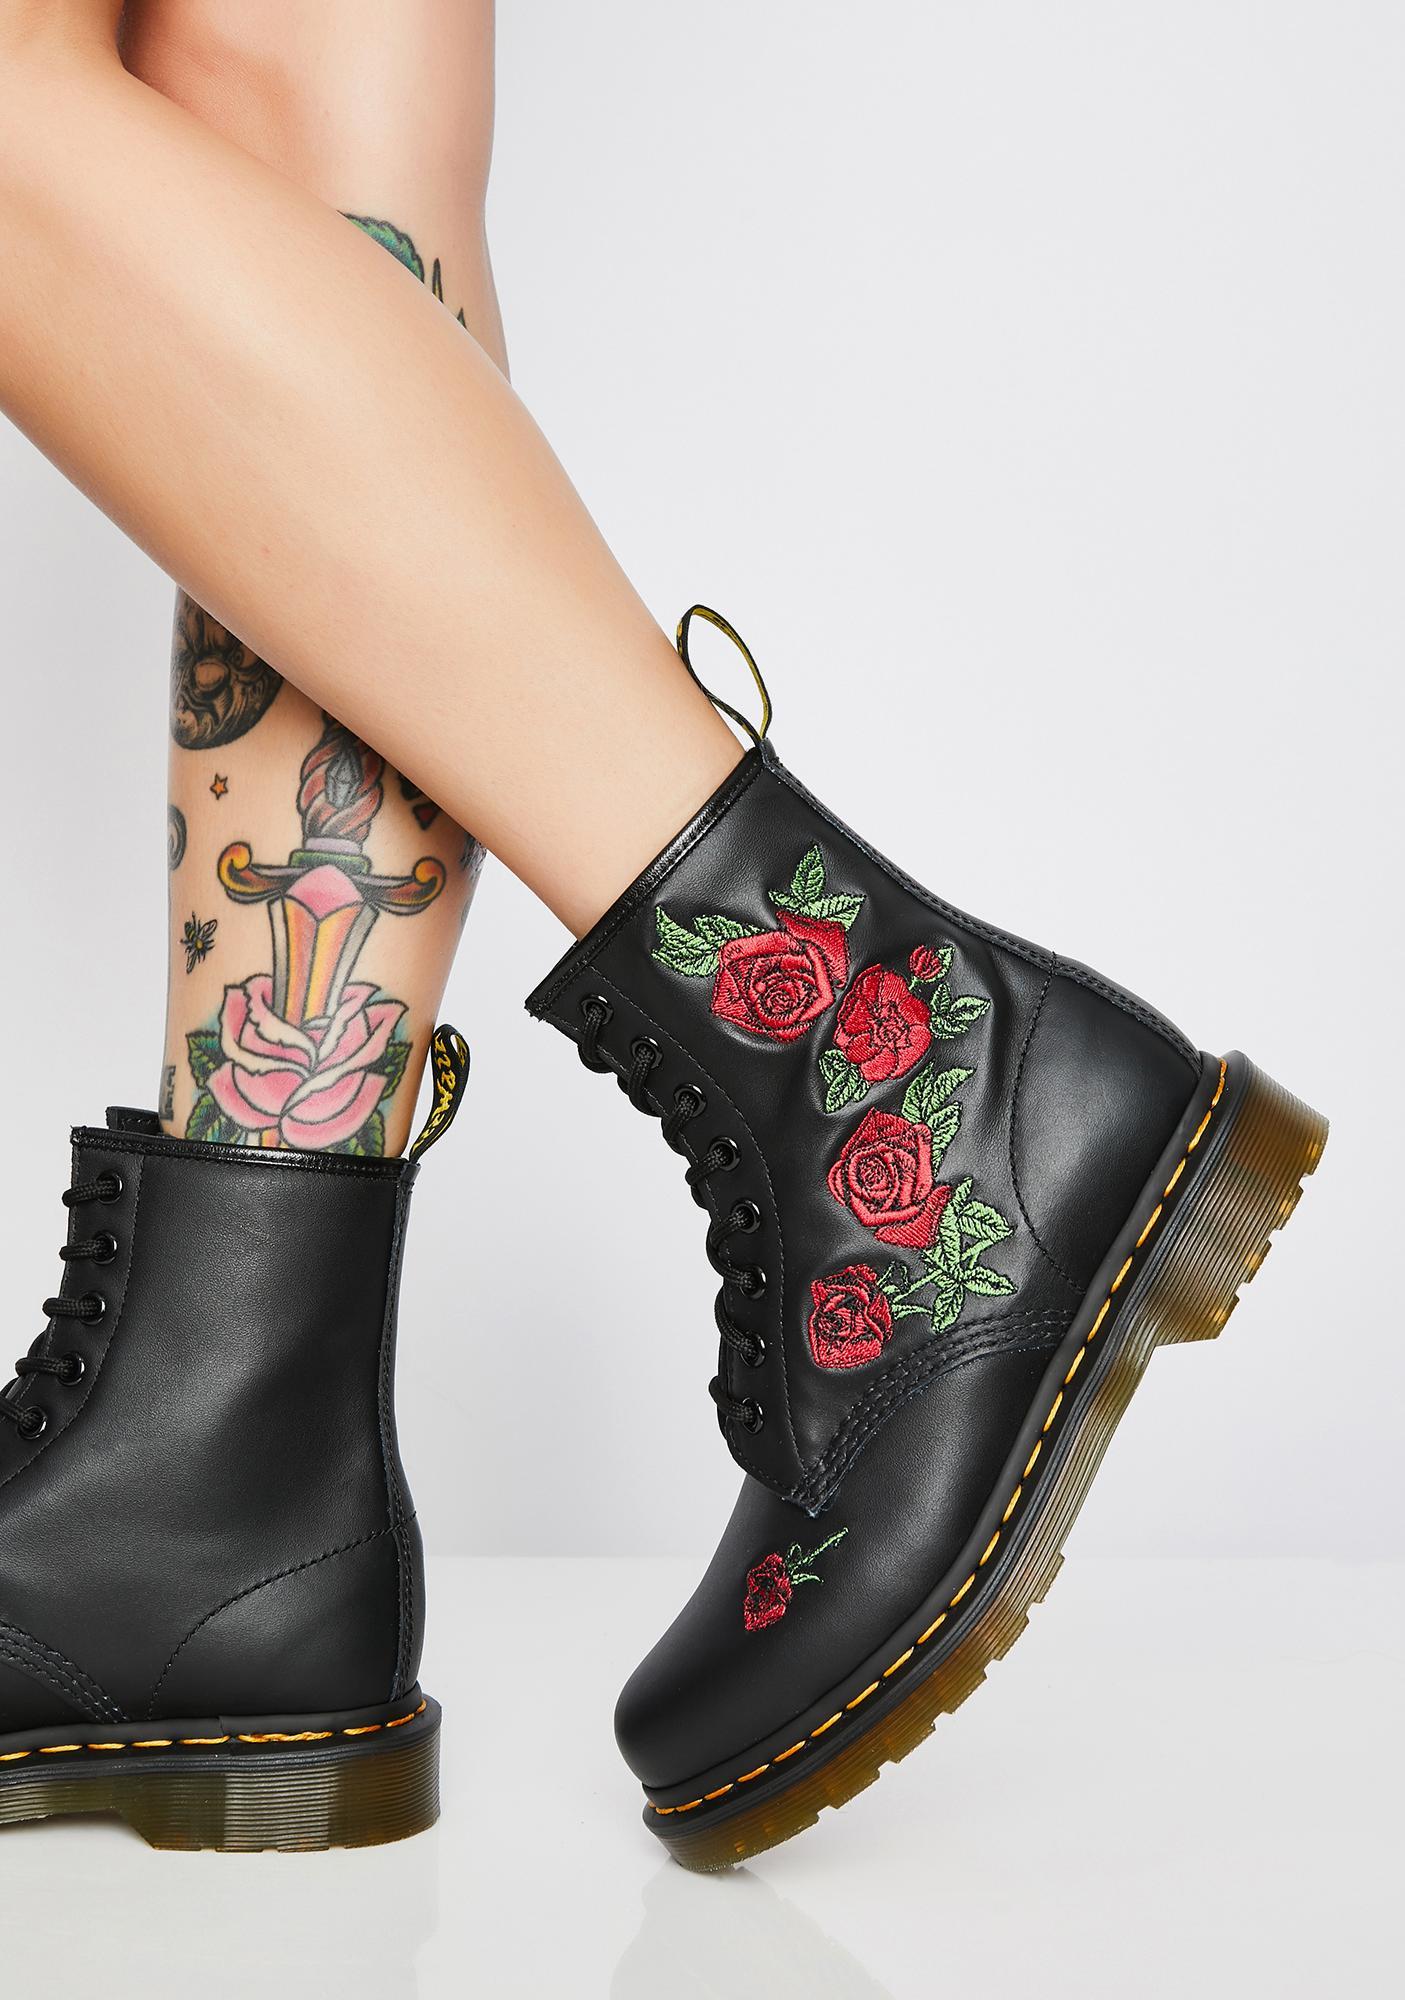 Dr. Martens 1460 Vonda Boots | Dolls Kill